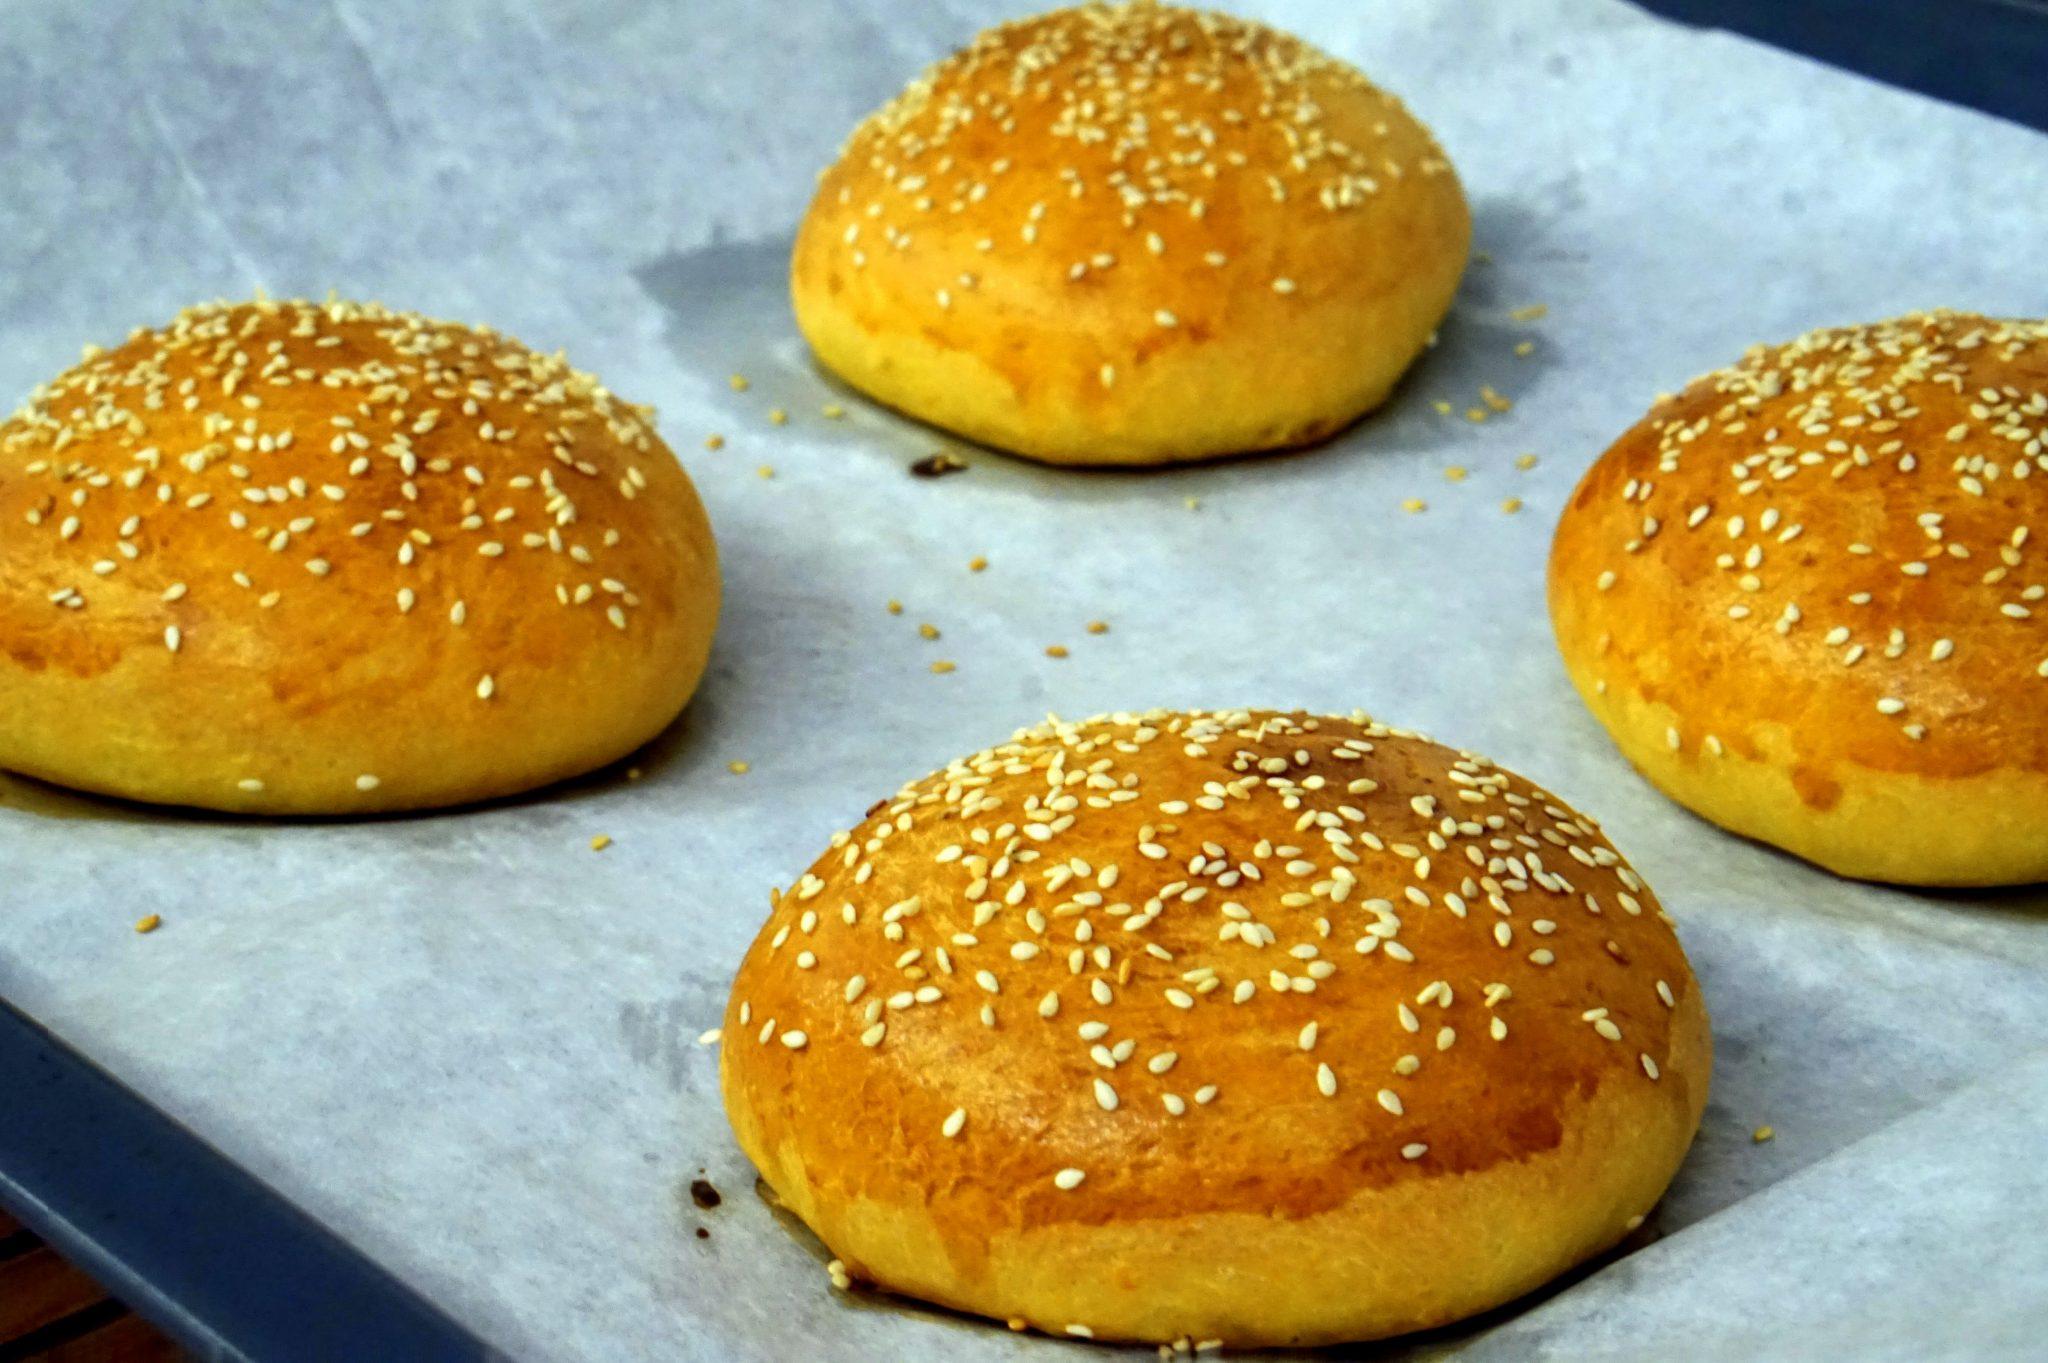 Ben noto Panini per Hamburger Homemade - Fun&Food PQ57